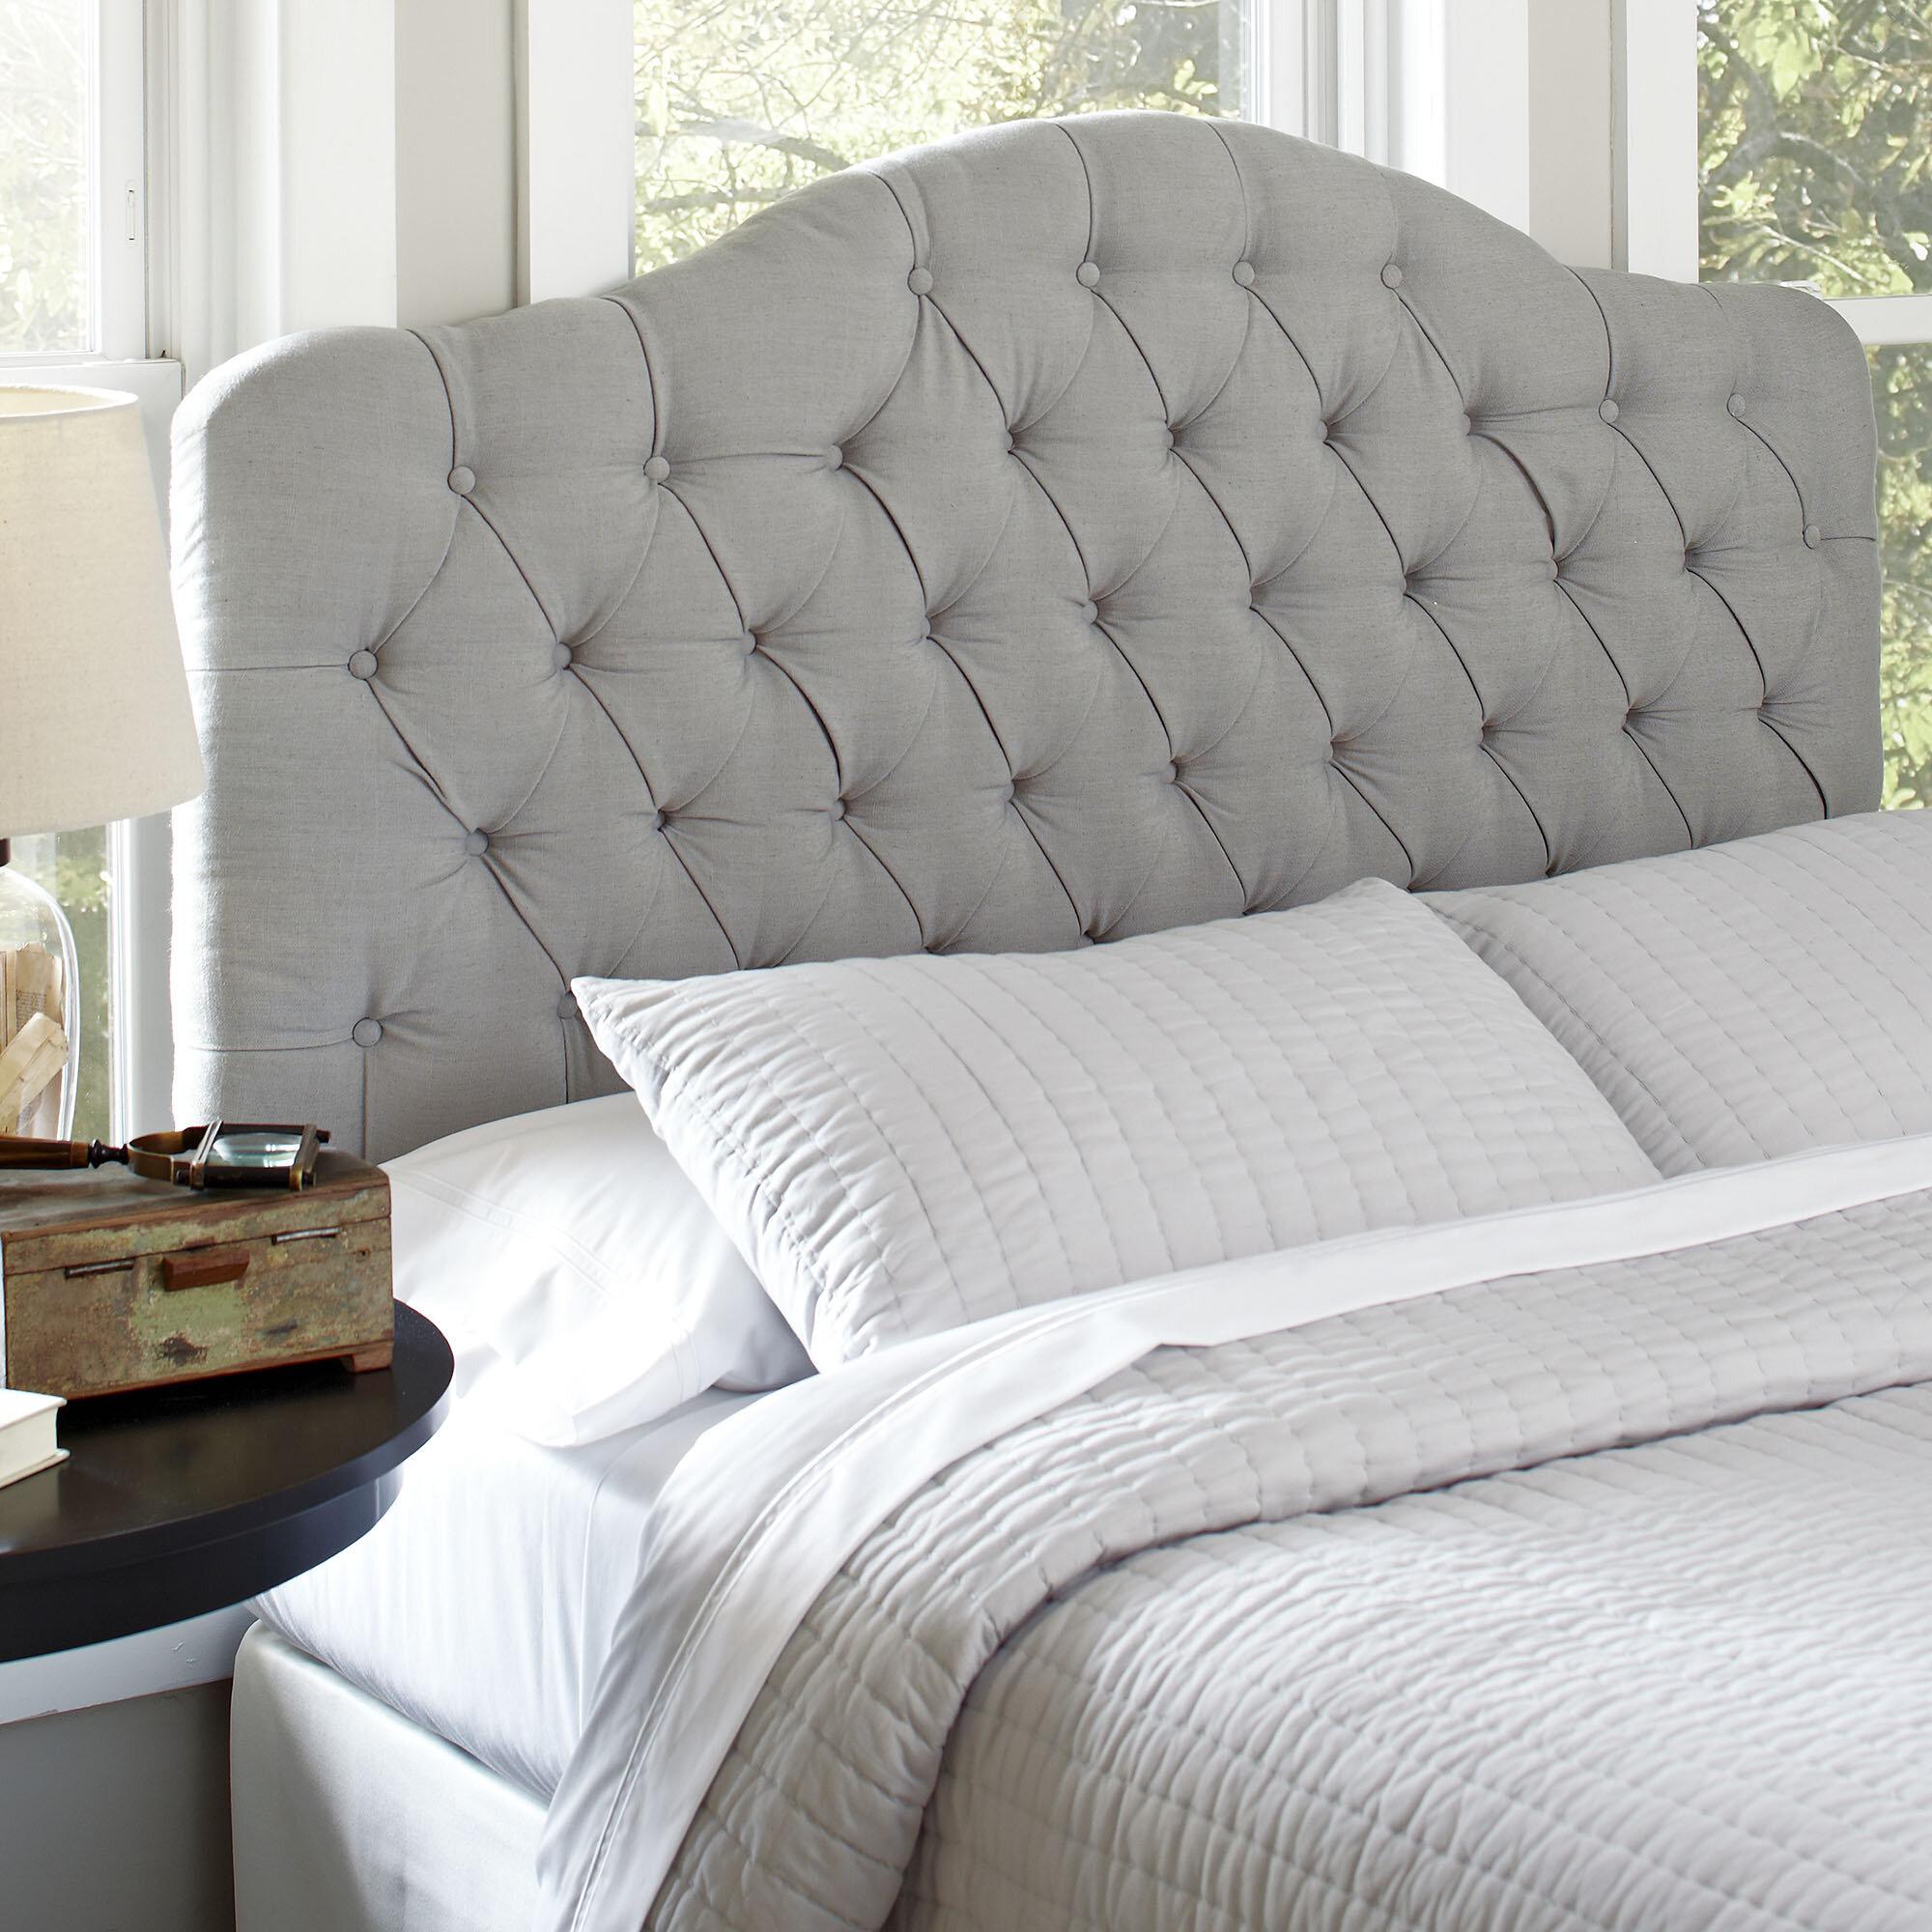 sale retailer 42785 11d53 Genevra Upholstered Panel Headboard